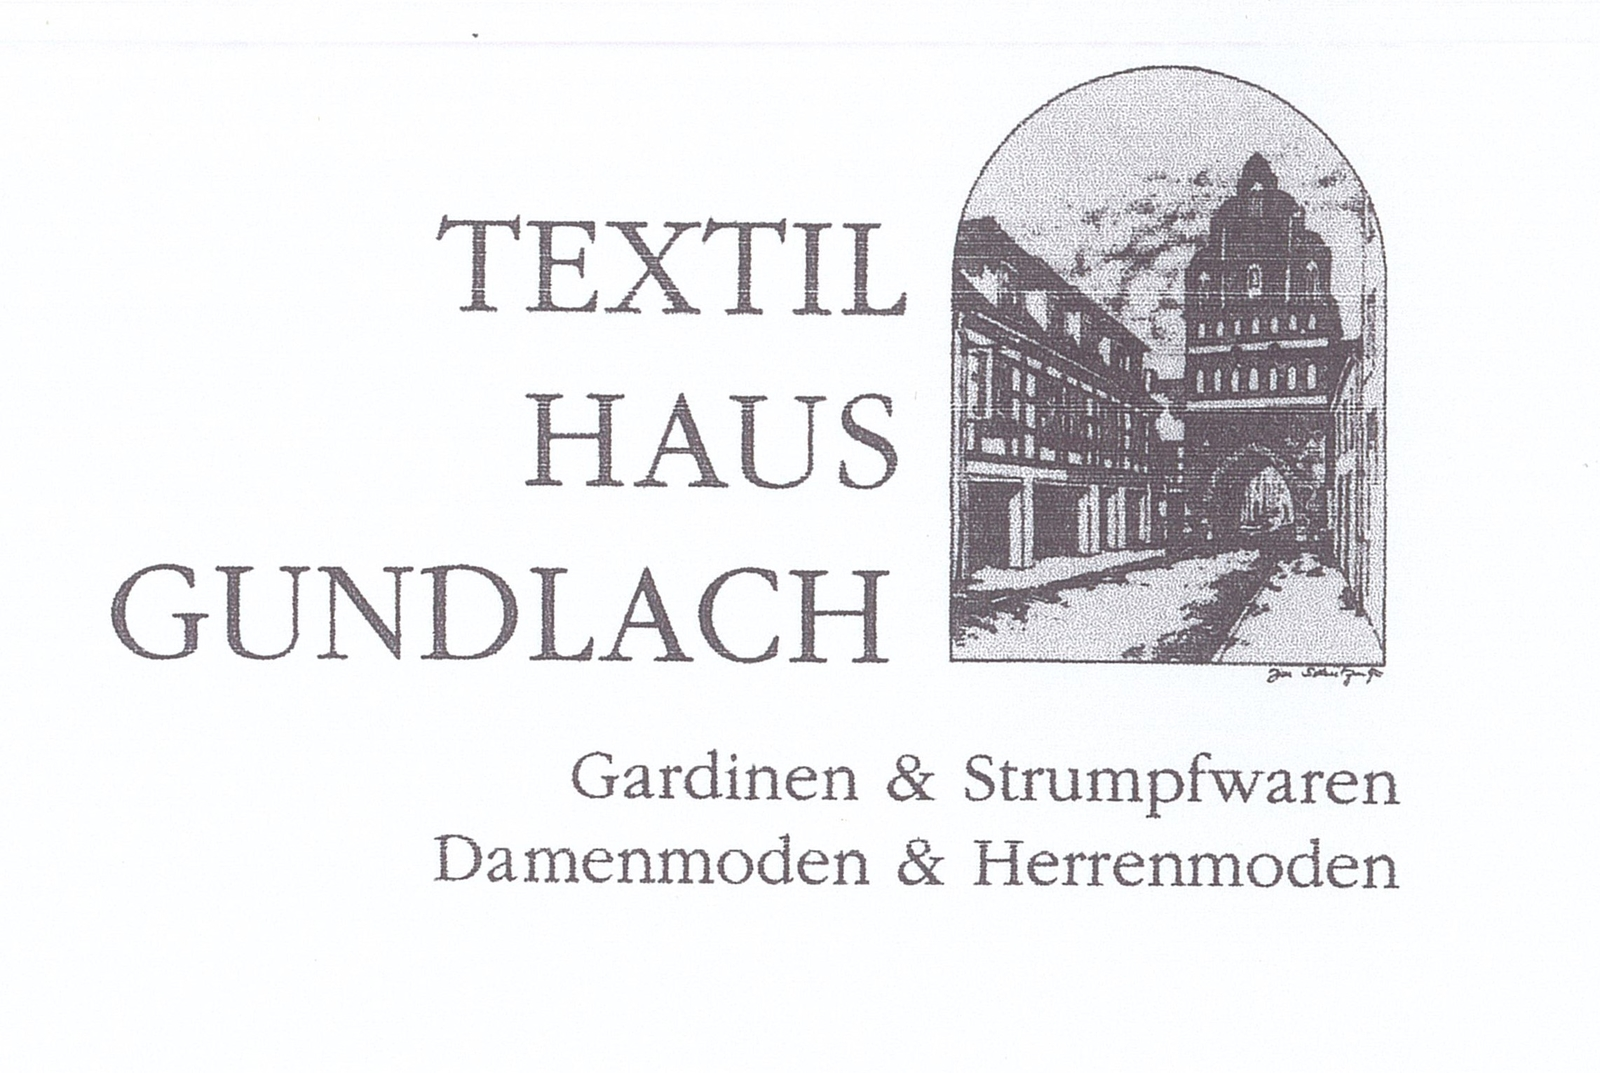 Textil gundlach logo